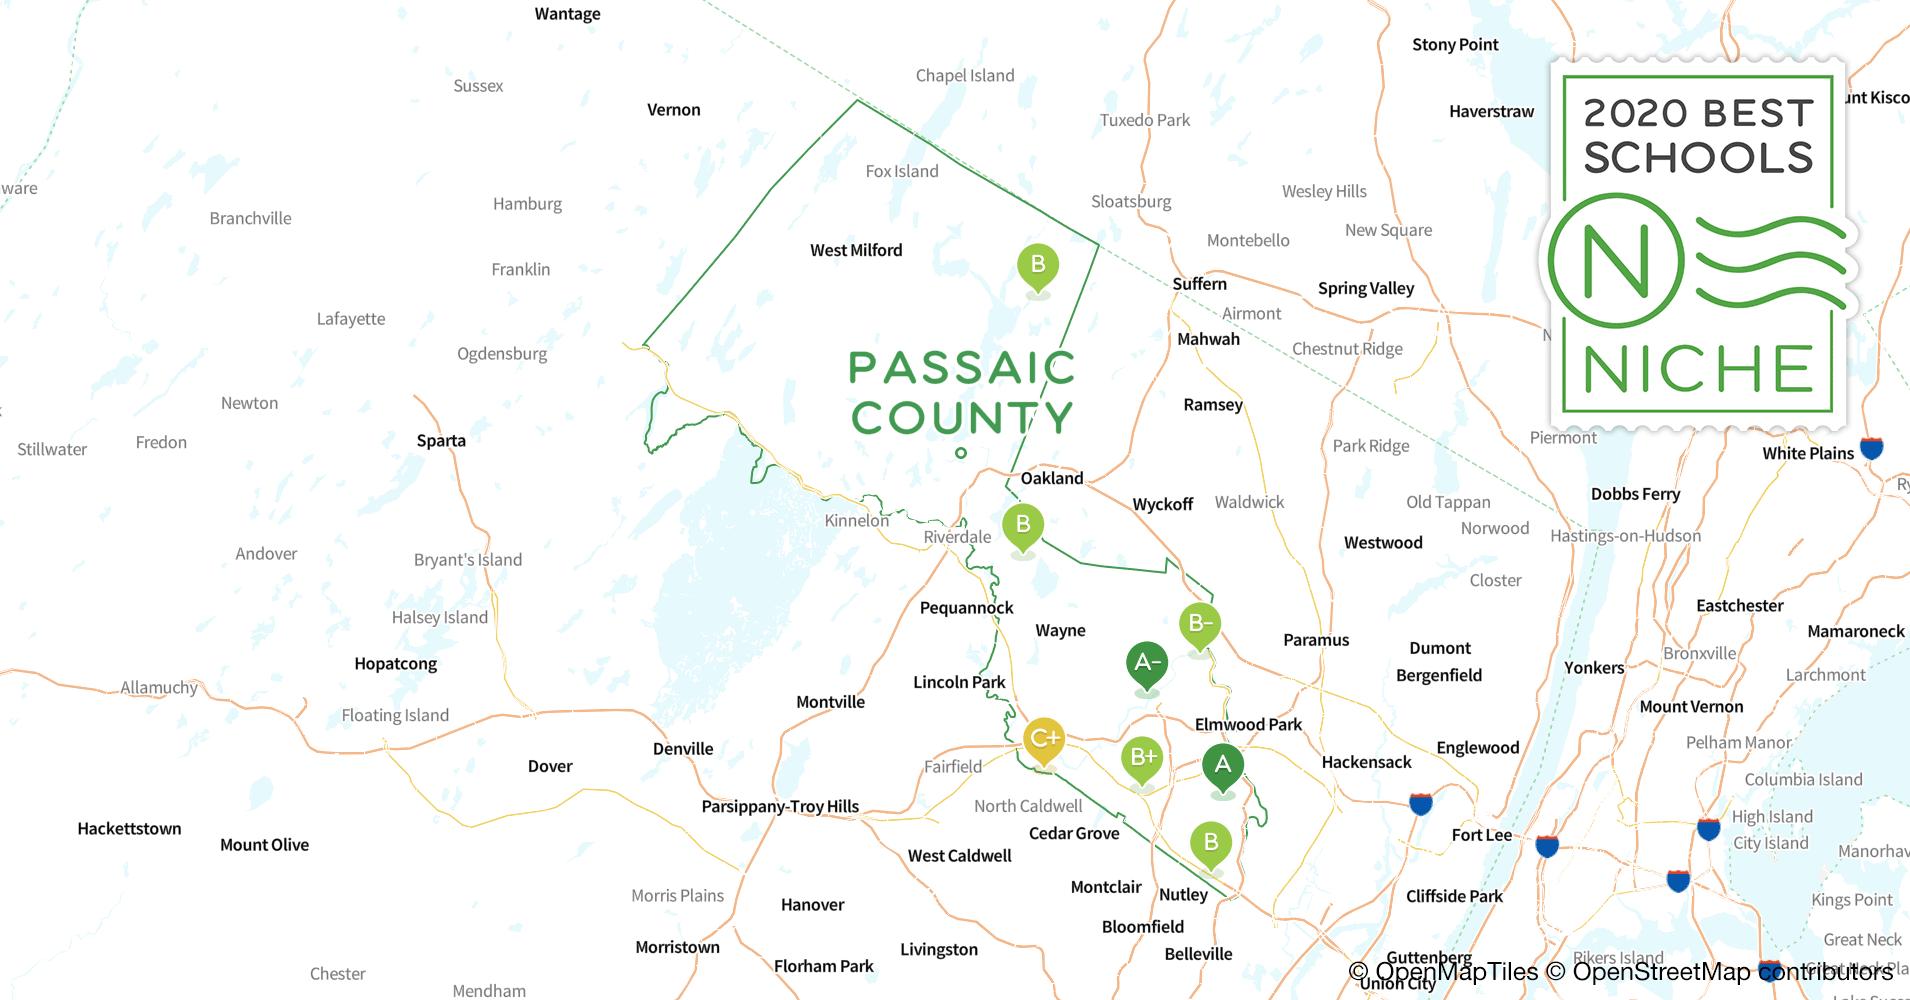 2020 Best Private High Schools in Passaic County, NJ - Niche